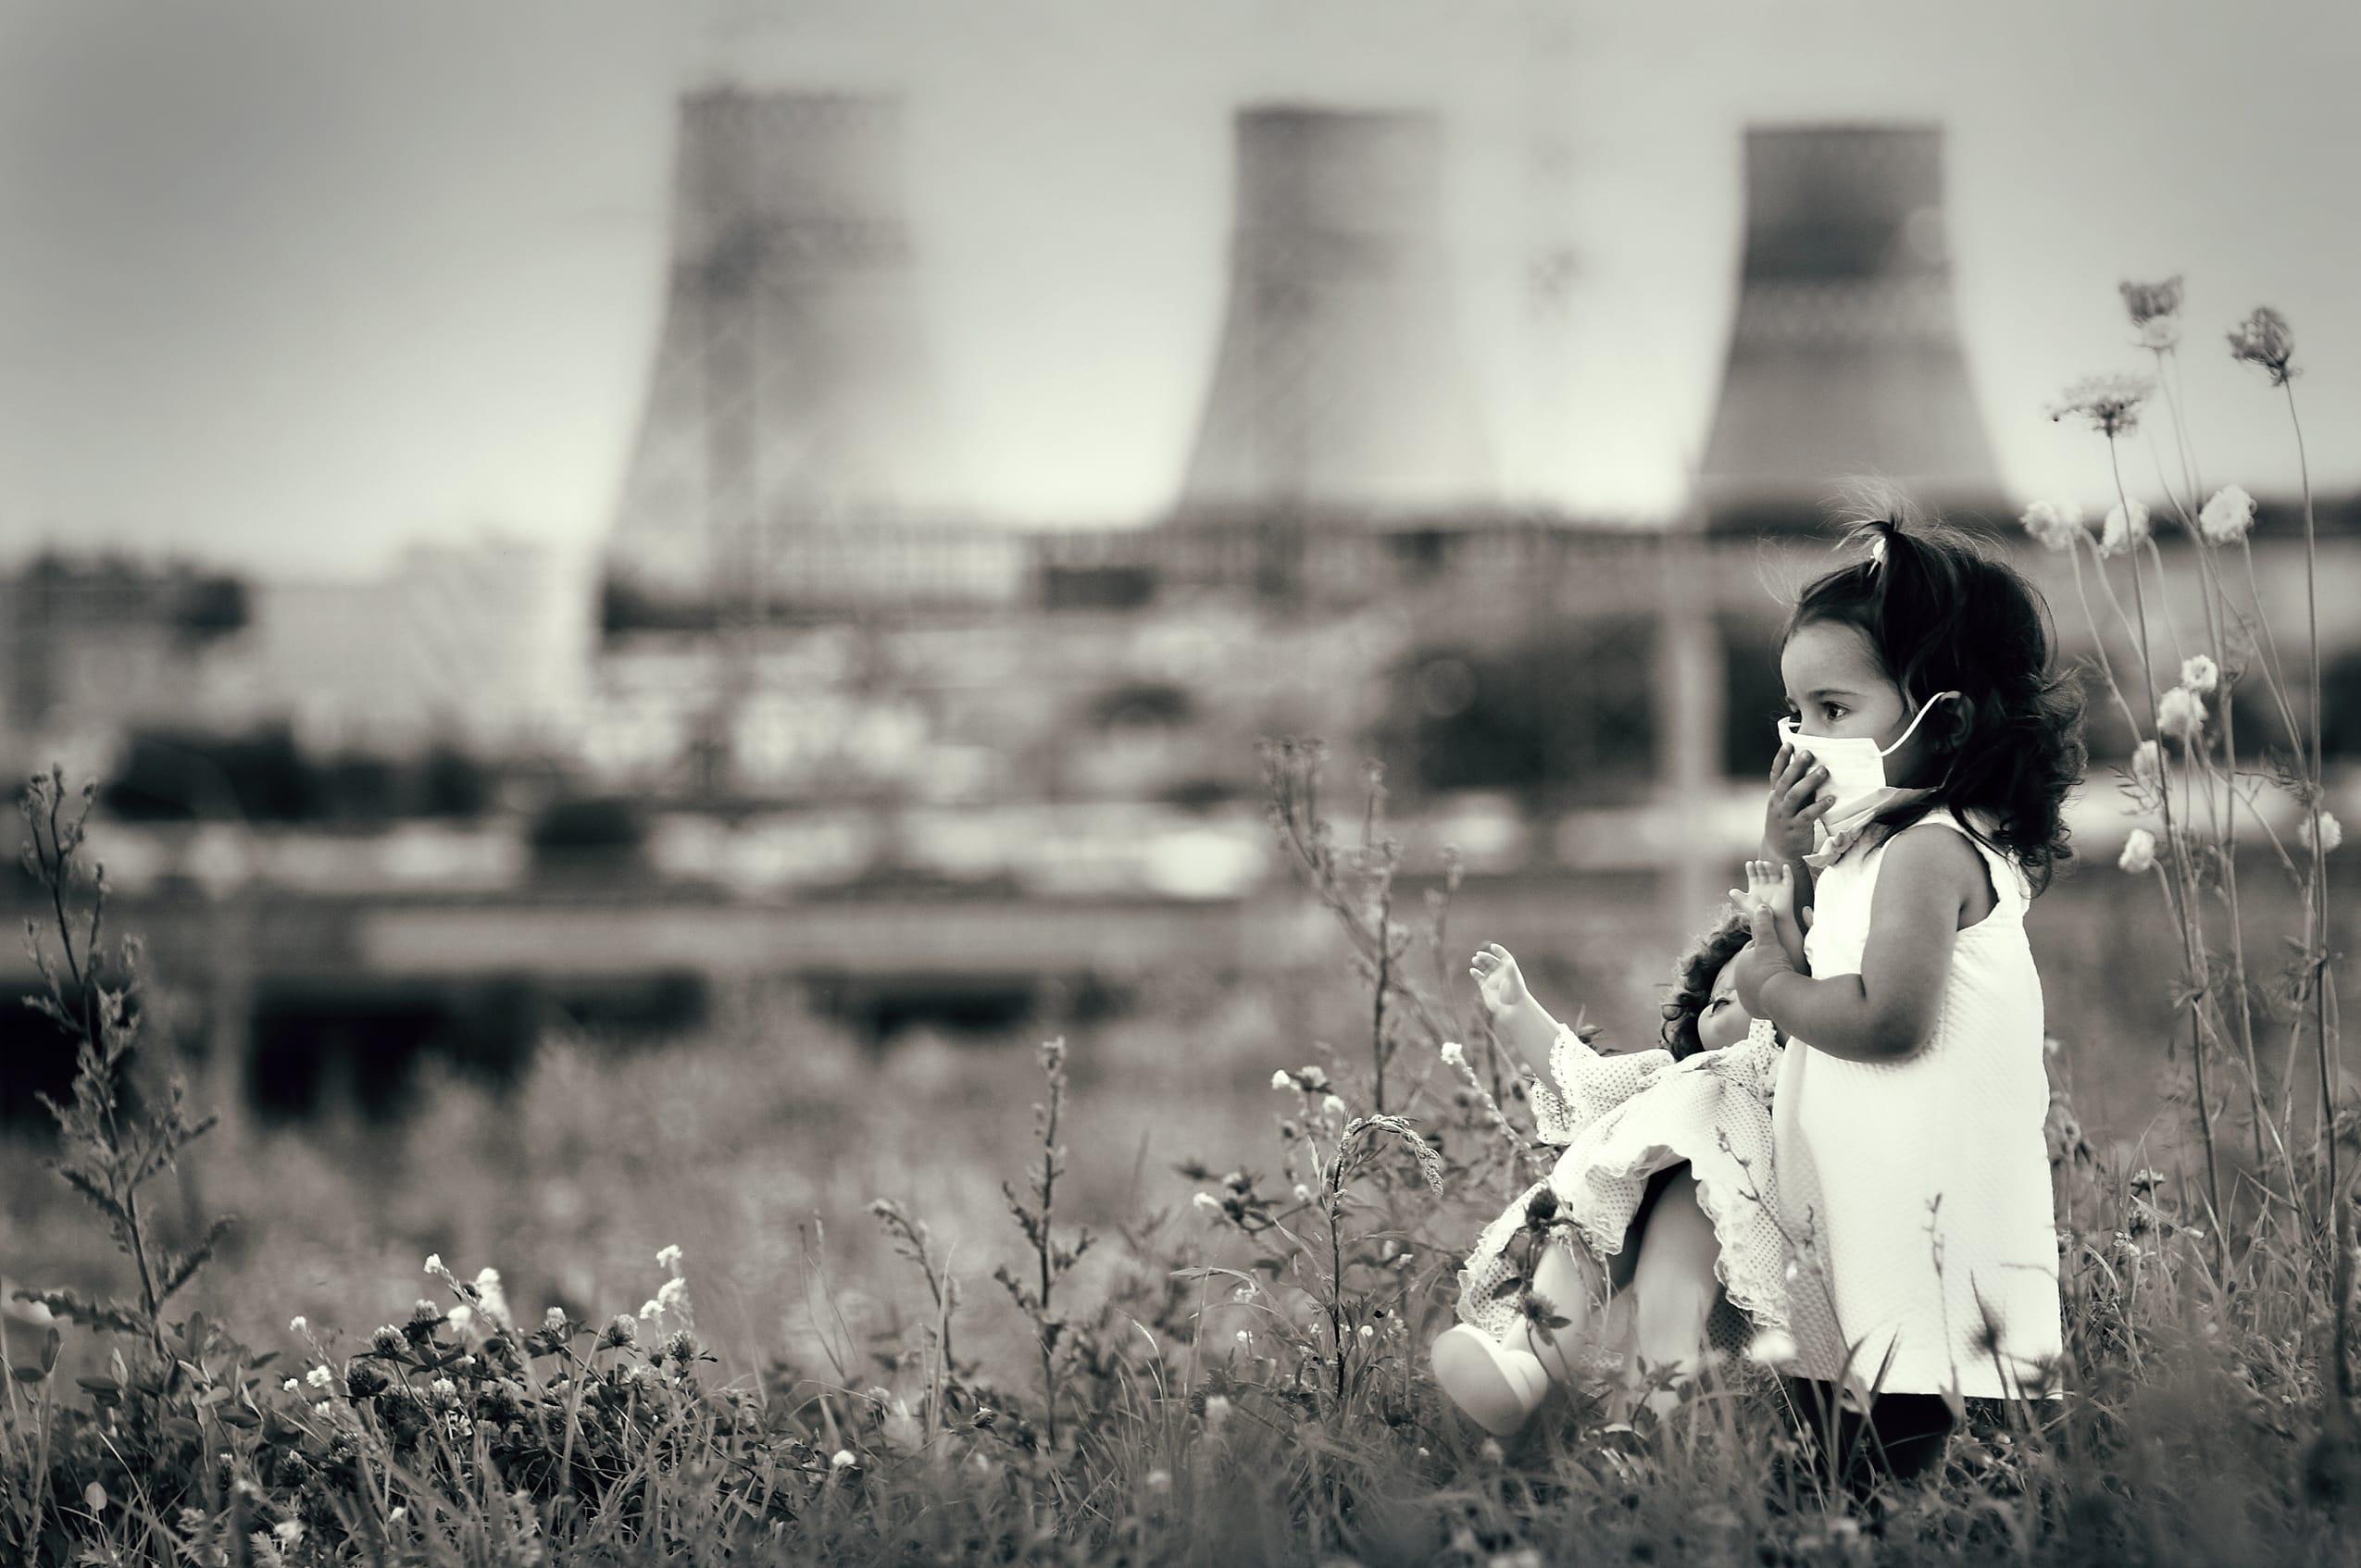 Lucht en vervuiling van lucht